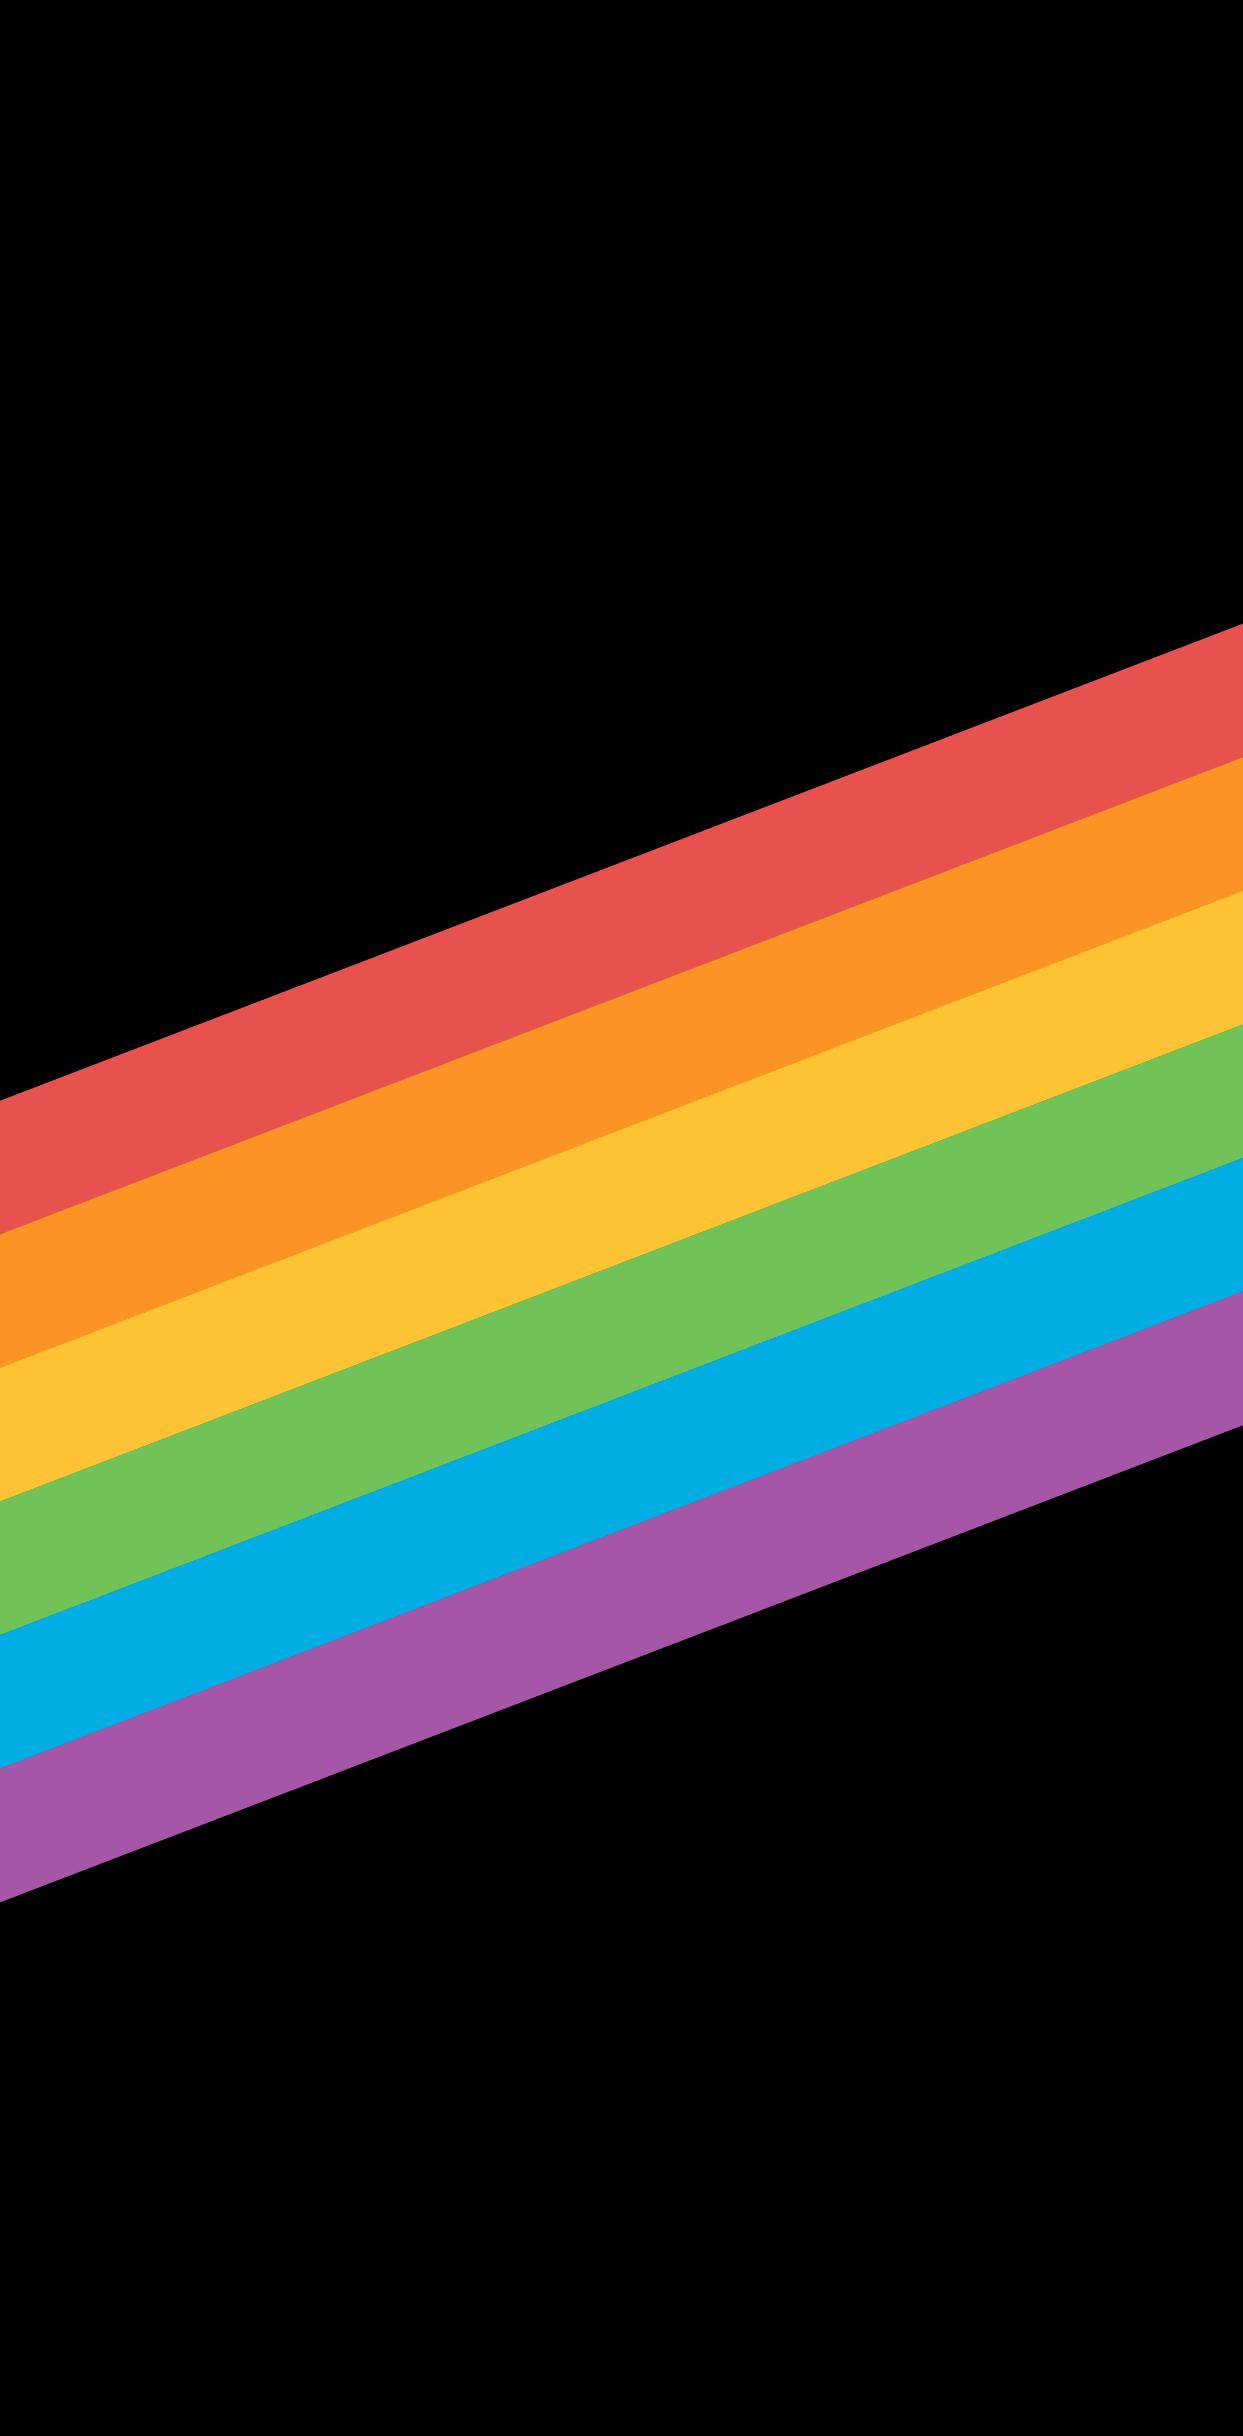 Rainbow flag design on black background